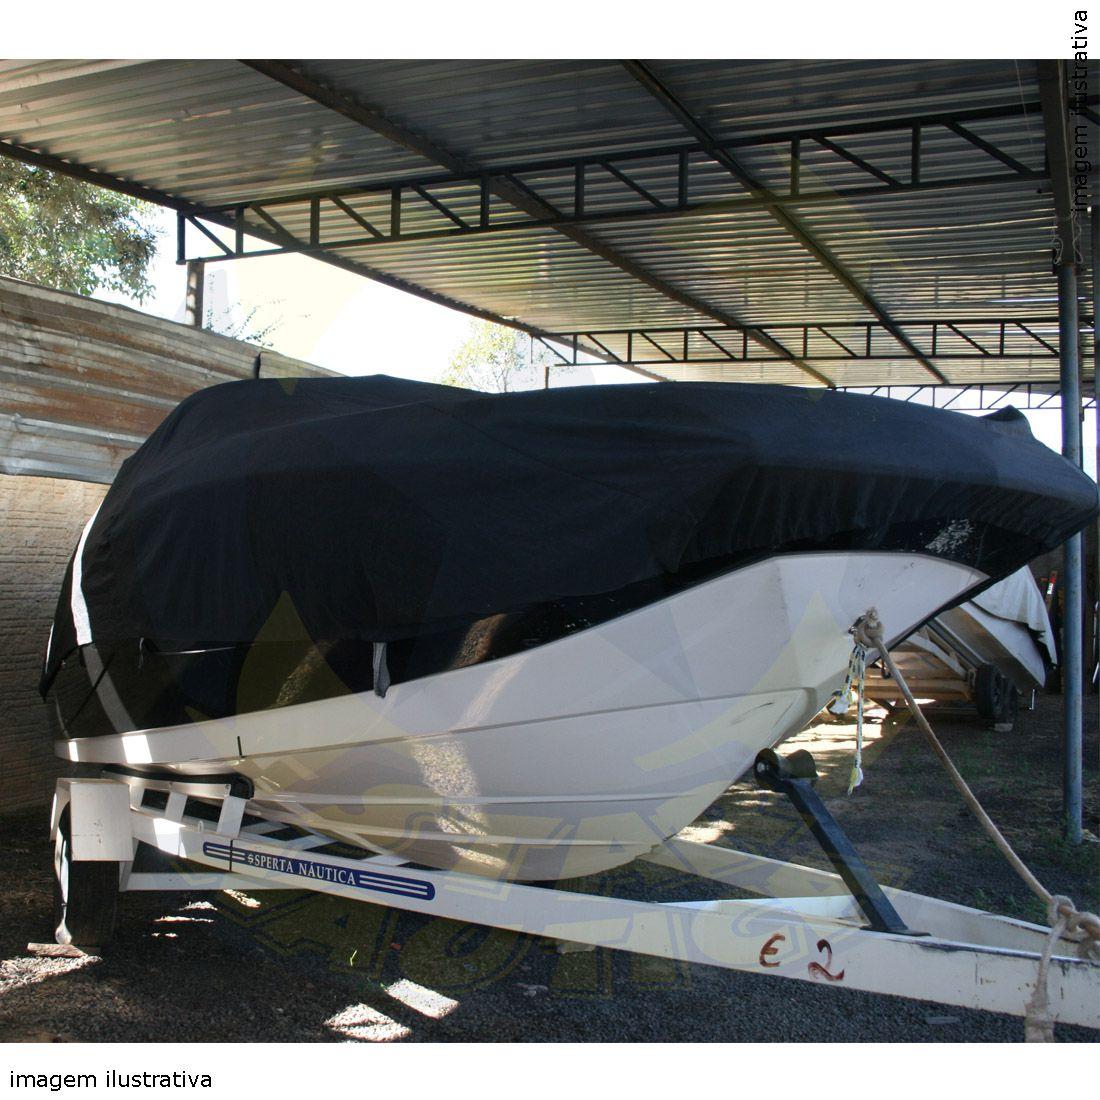 Capa Lona de Cobertura Lancha Focker 222 Lona Poliéster